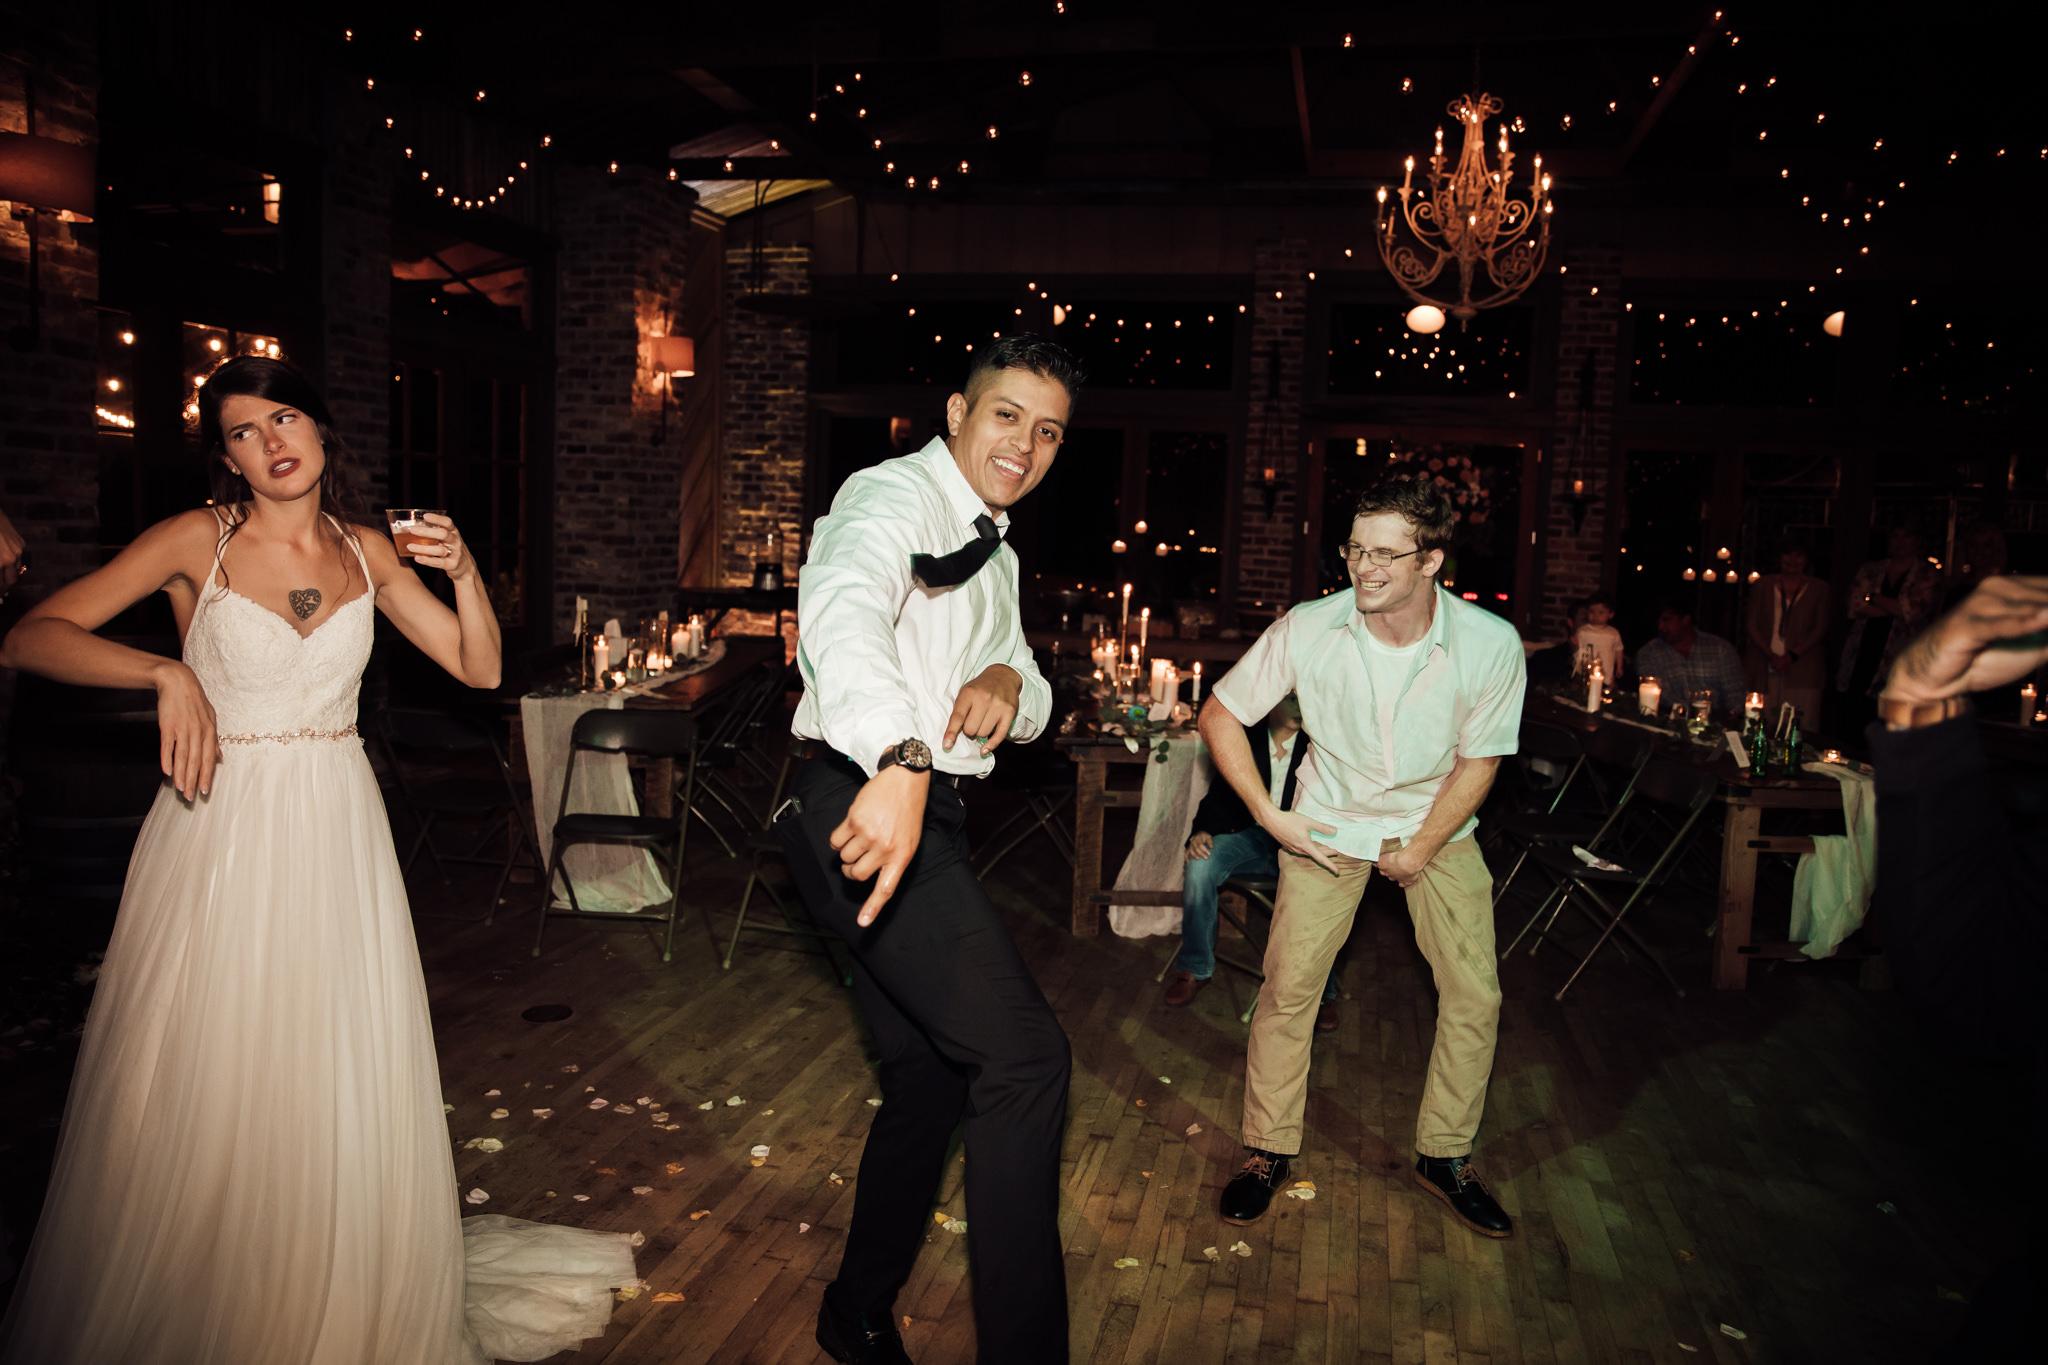 phantom-canyon-brewery-colorado-springs-wedding-photographer-470.jpg